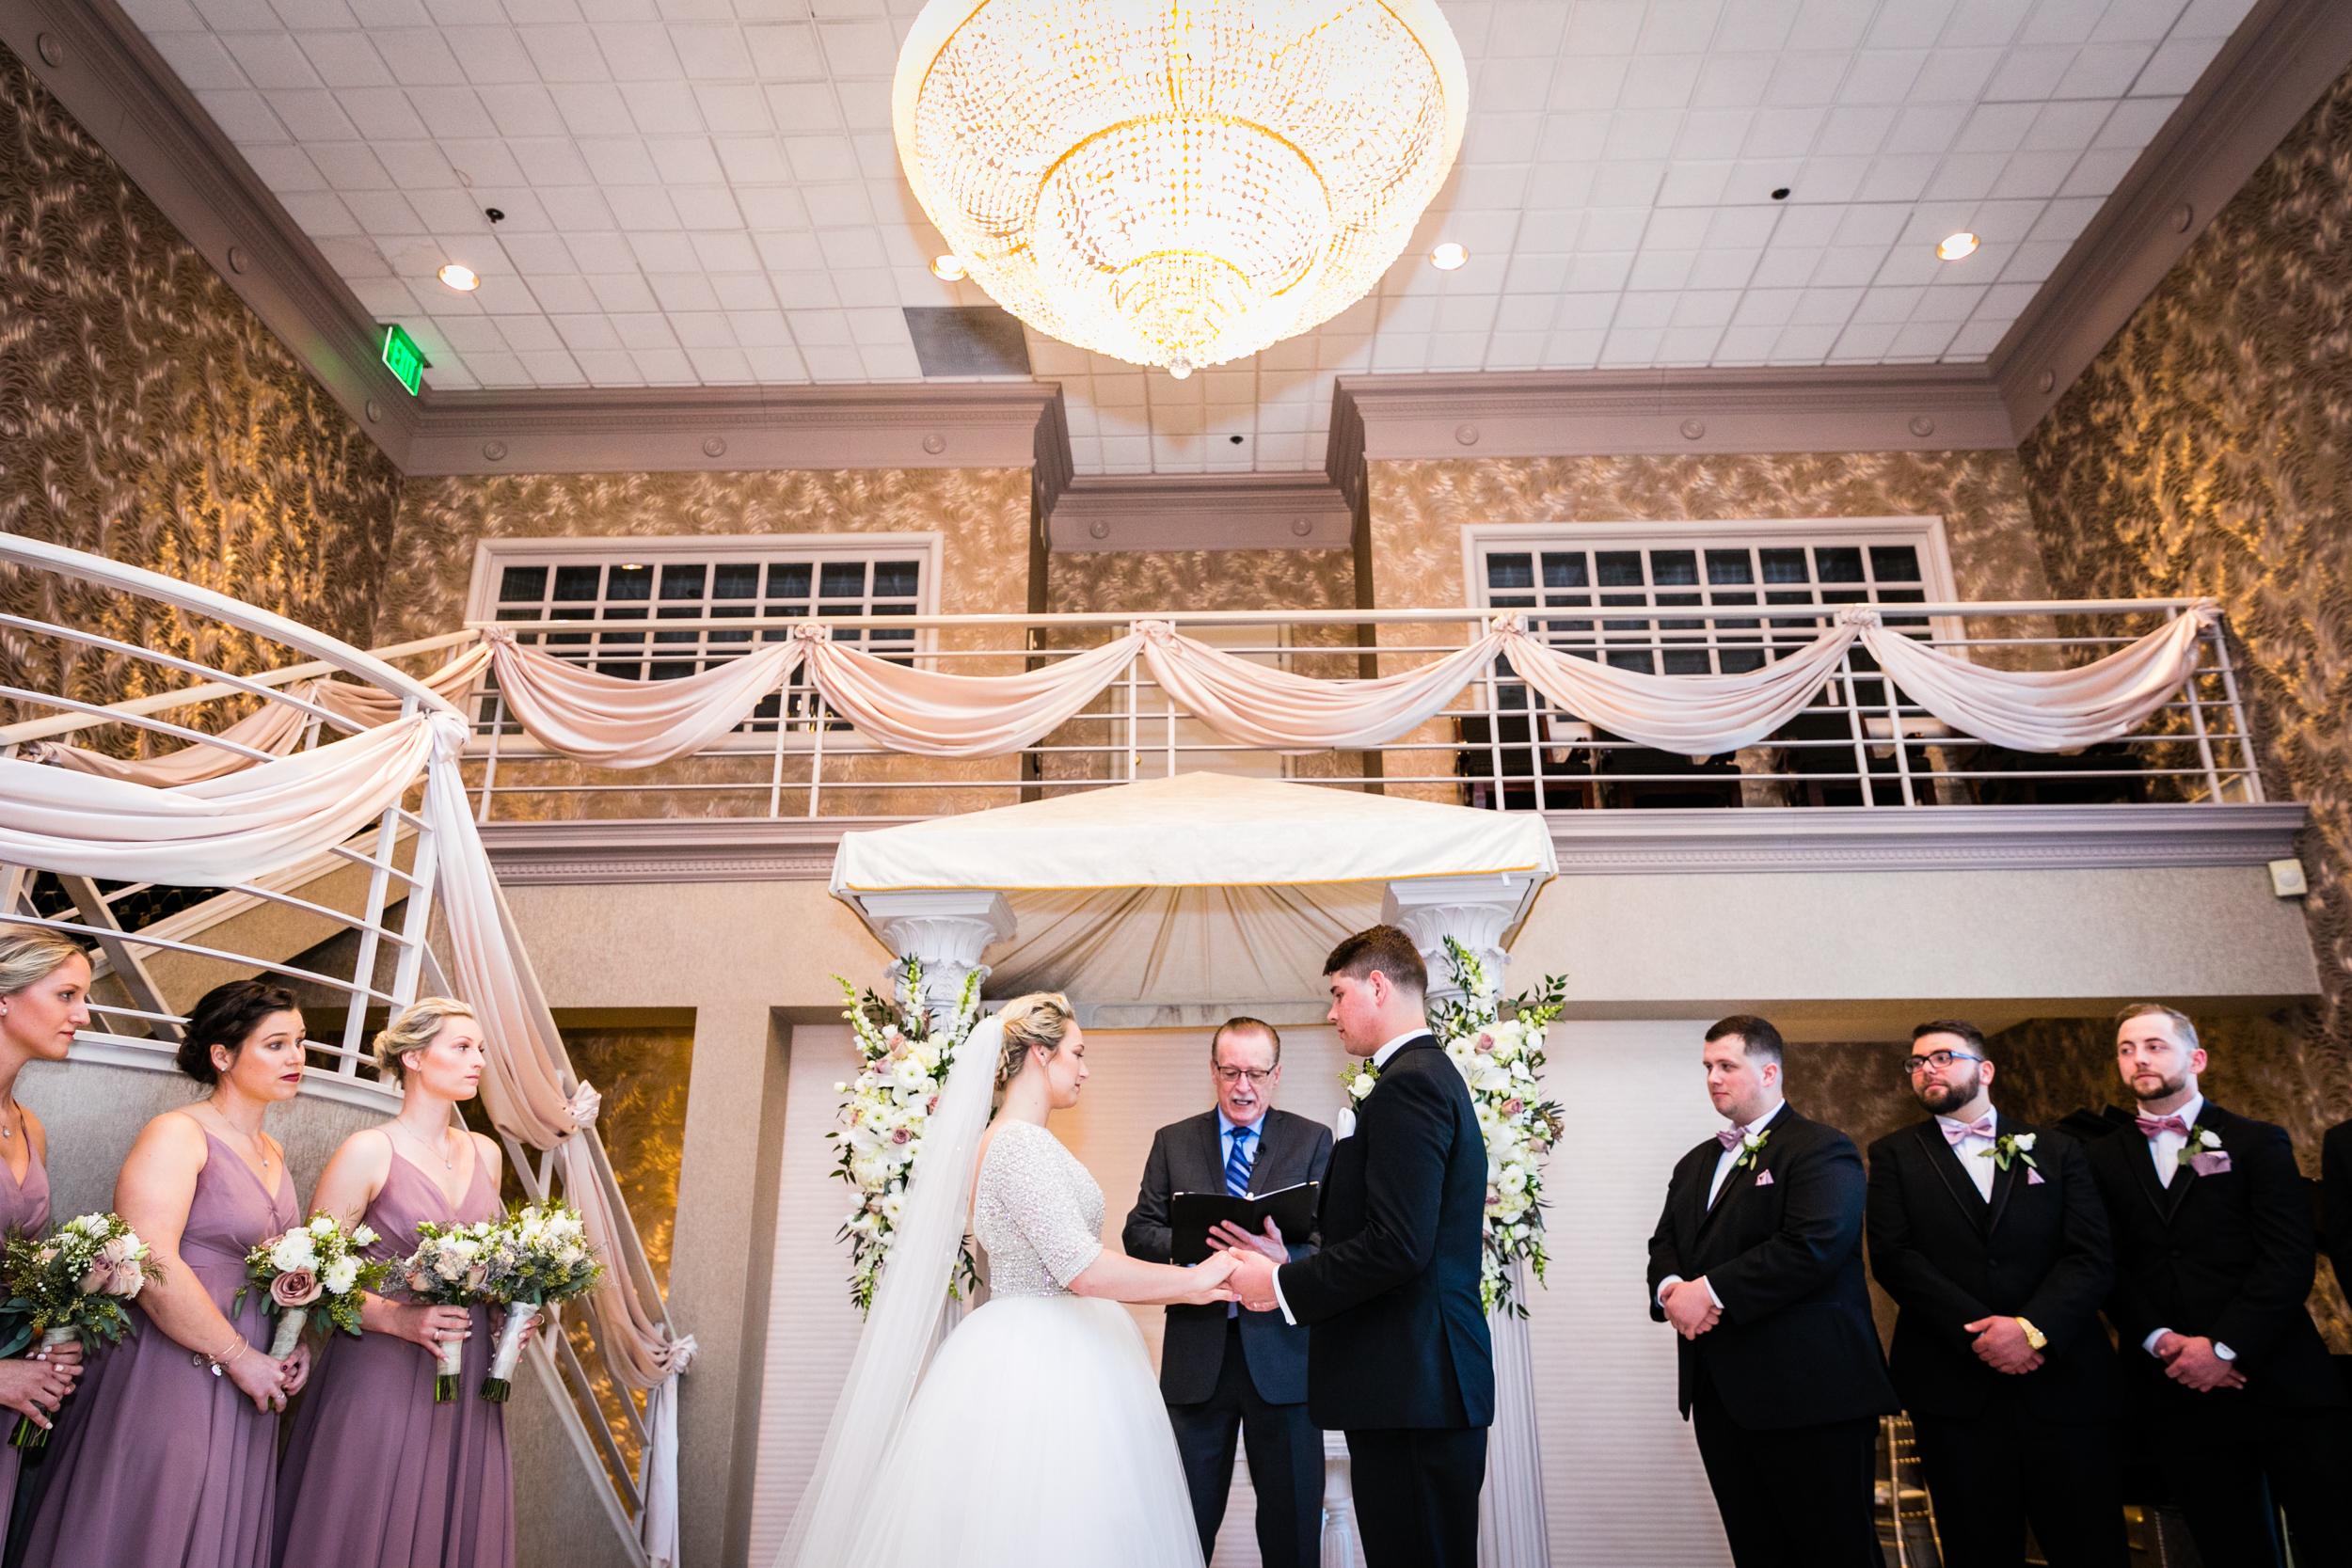 CELEBRATIONS BENSALEM WEDDING PHOTOGRAPHY-51.jpg